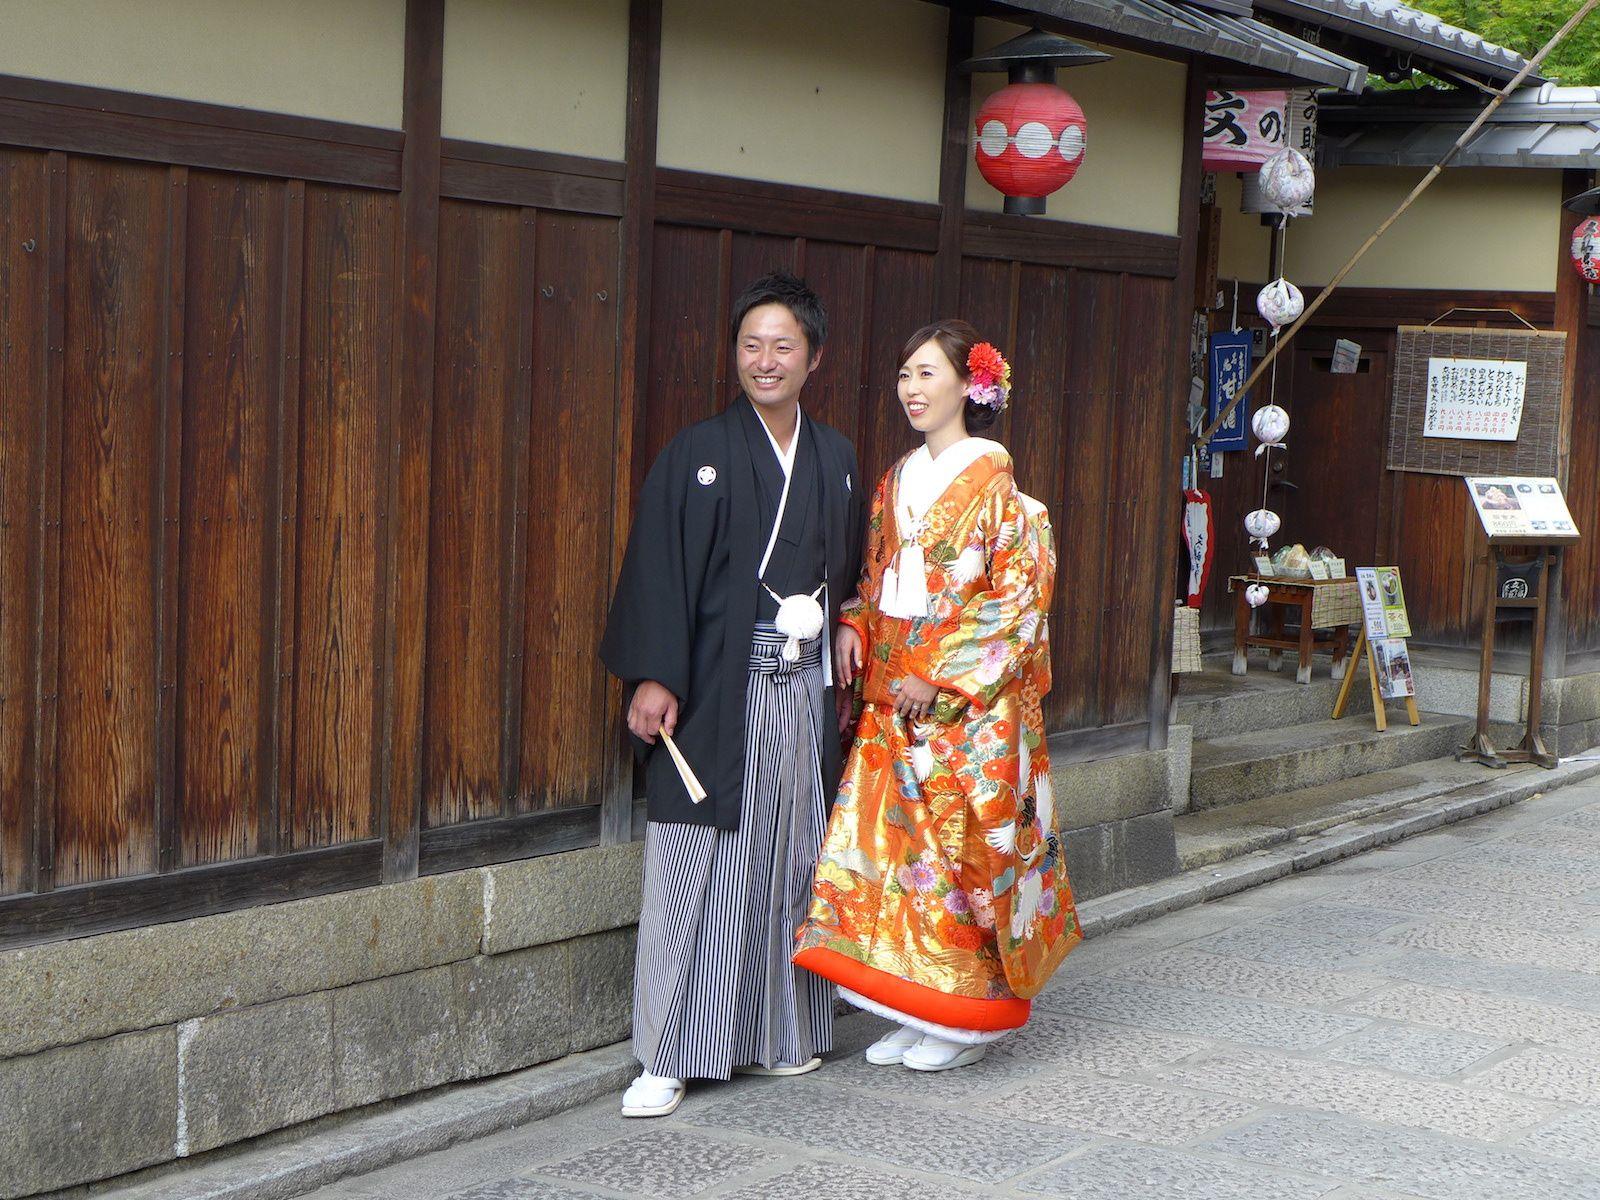 Inara Fushimi